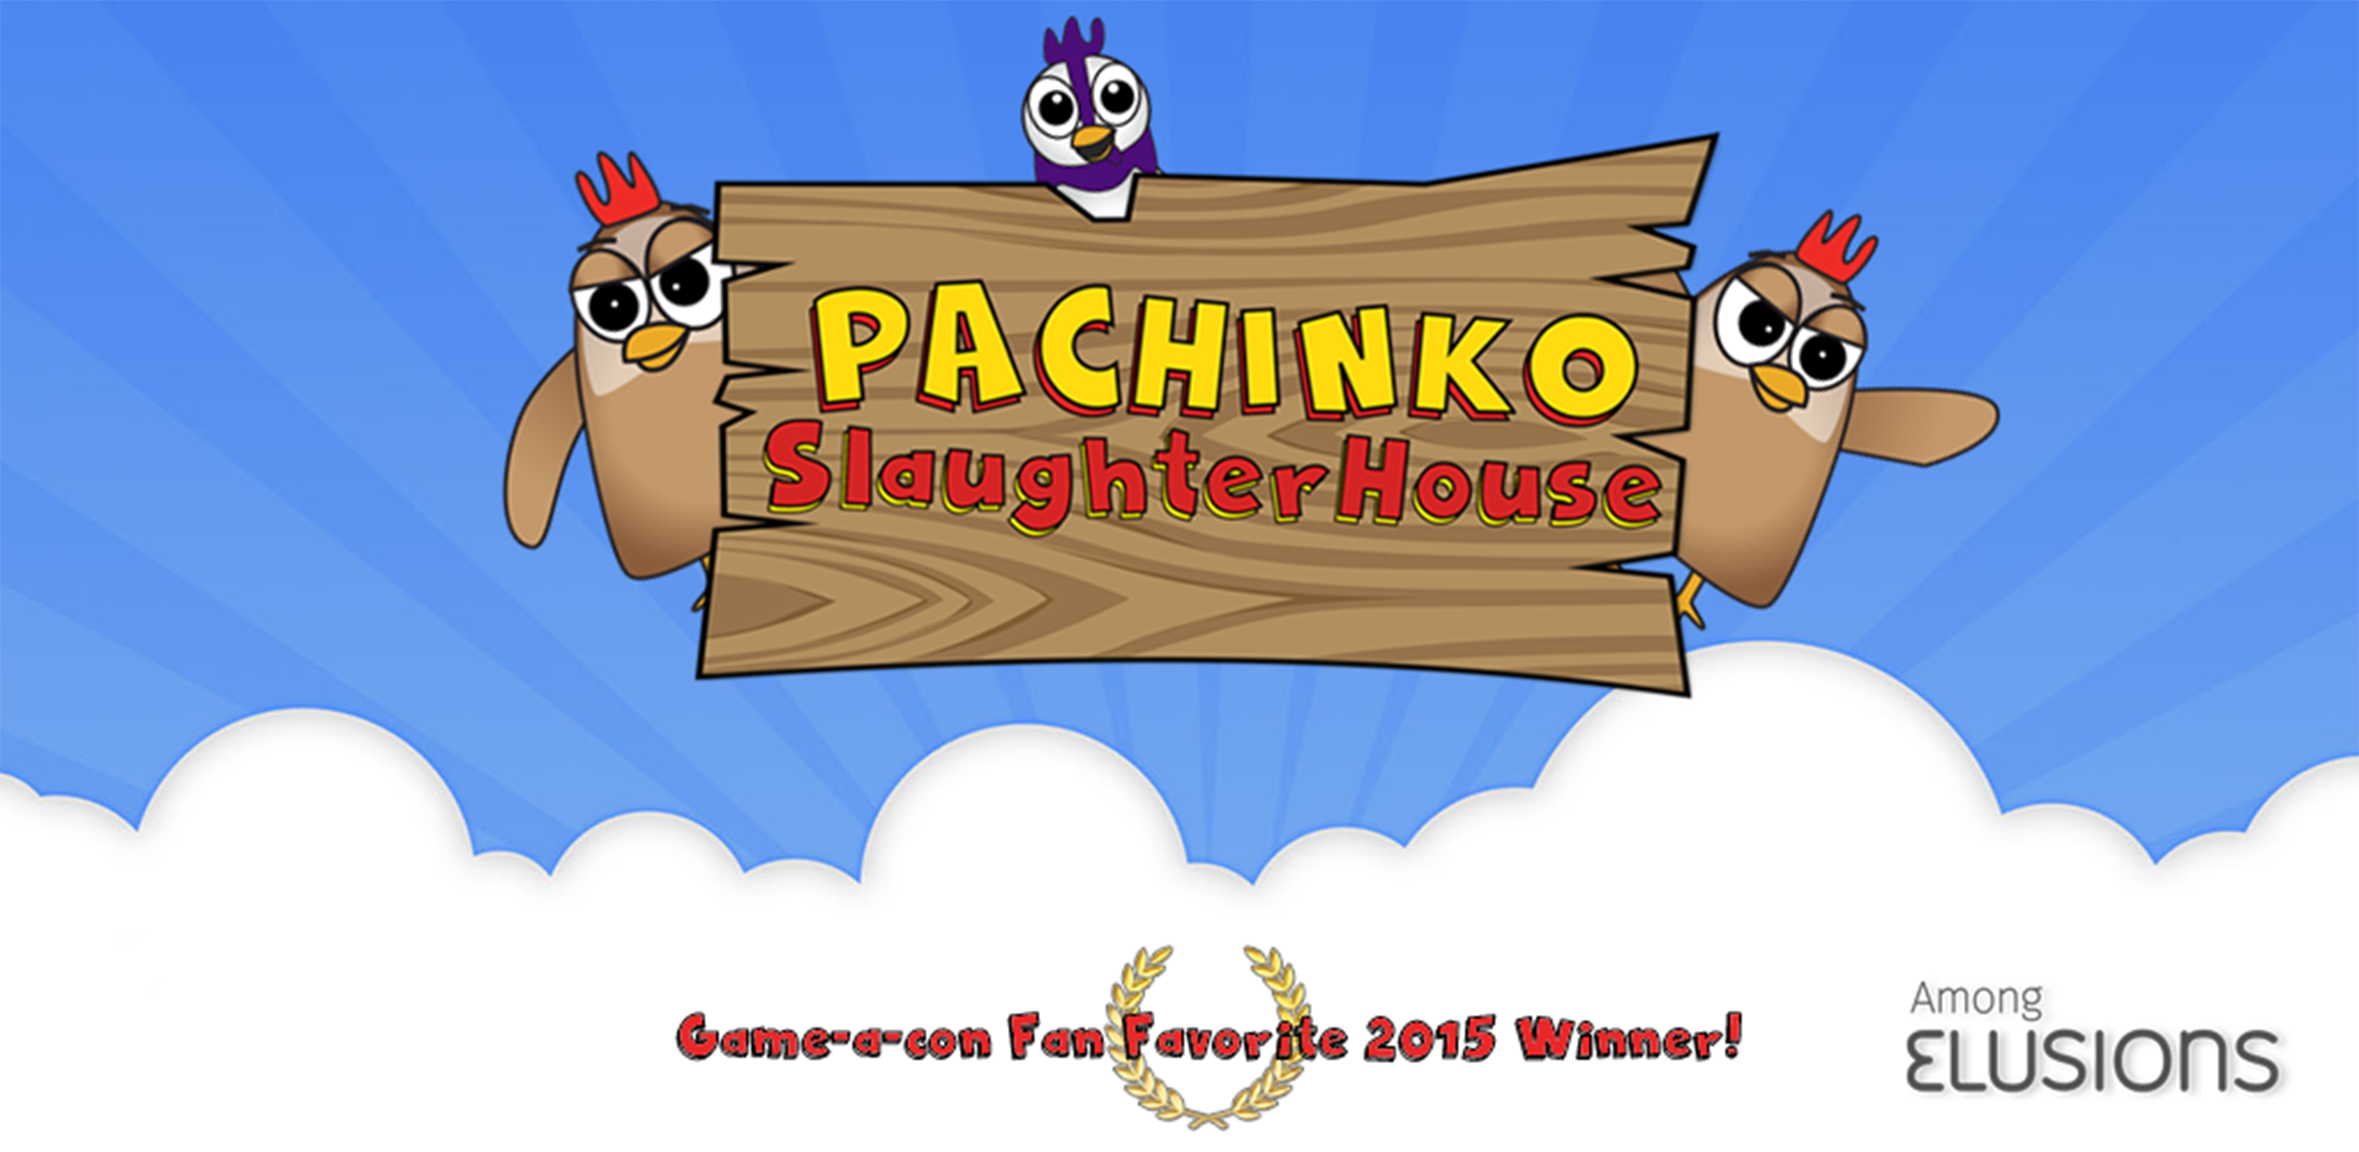 Pachinko Slaughterhouse